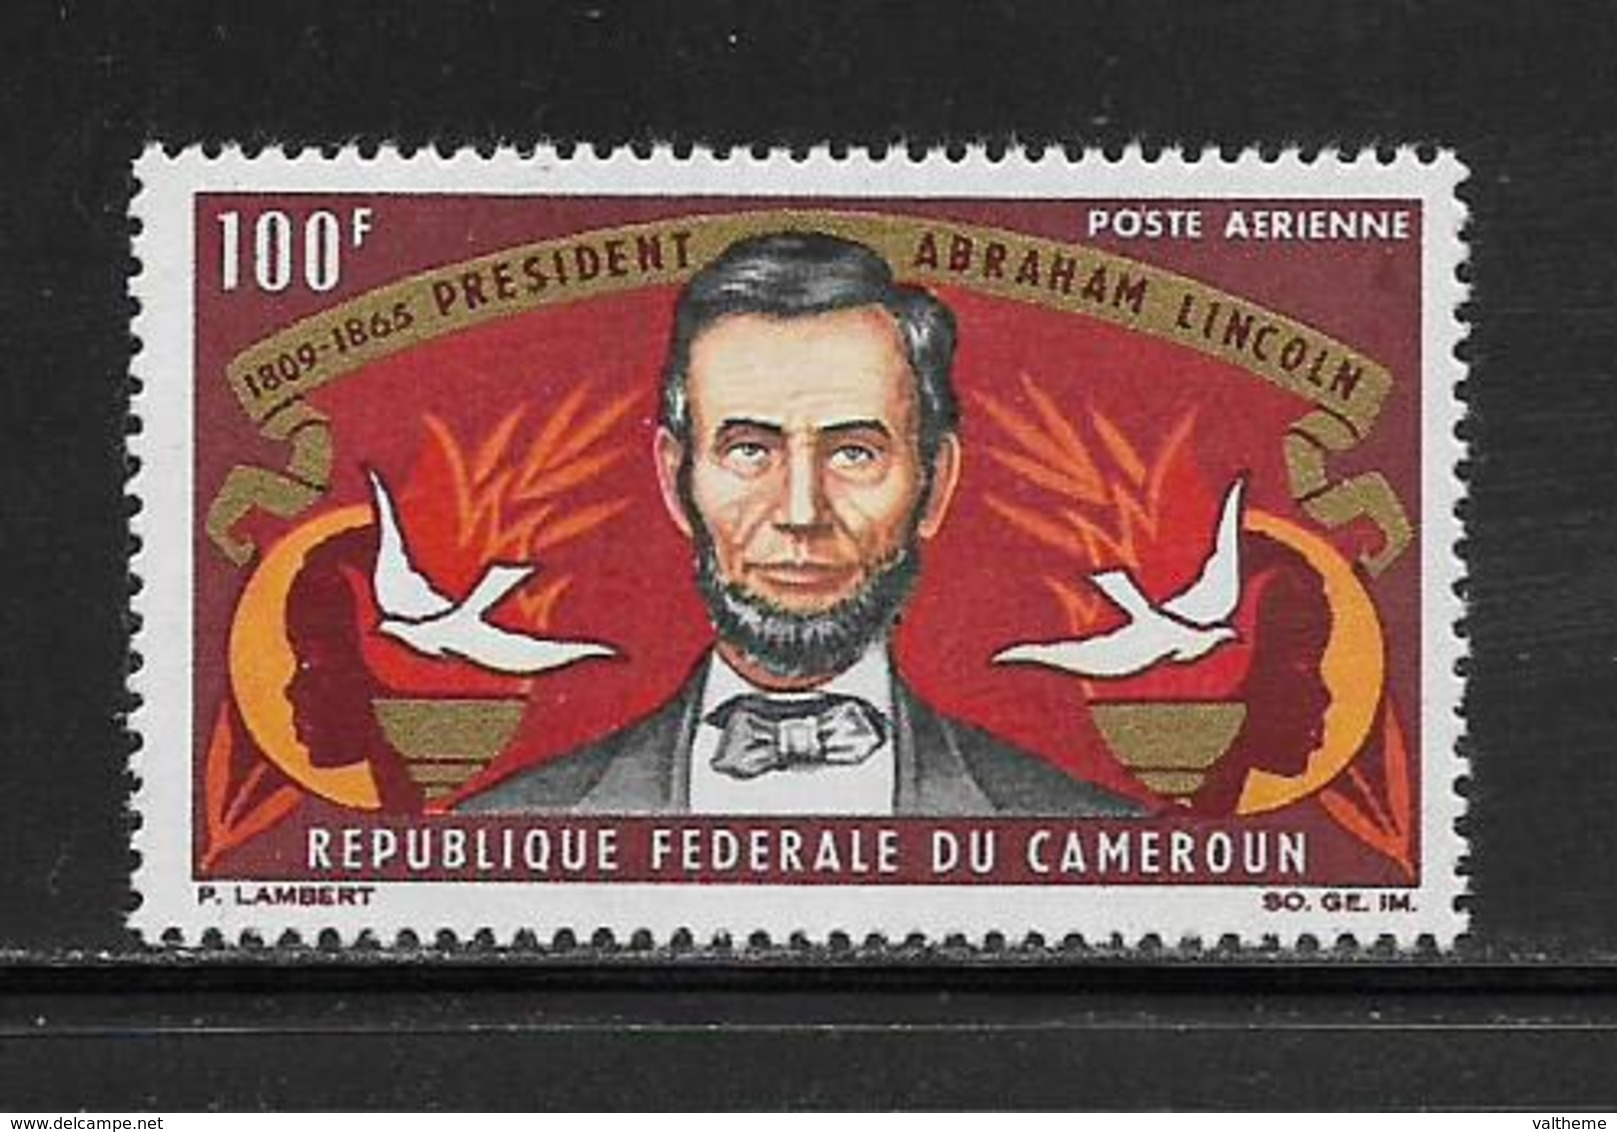 CAMEROUN  ( AFCA - 54 )  1965  N° YVERT ET TELLIER  POSTE AERIENNE N° 64   N** - Cameroun (1960-...)